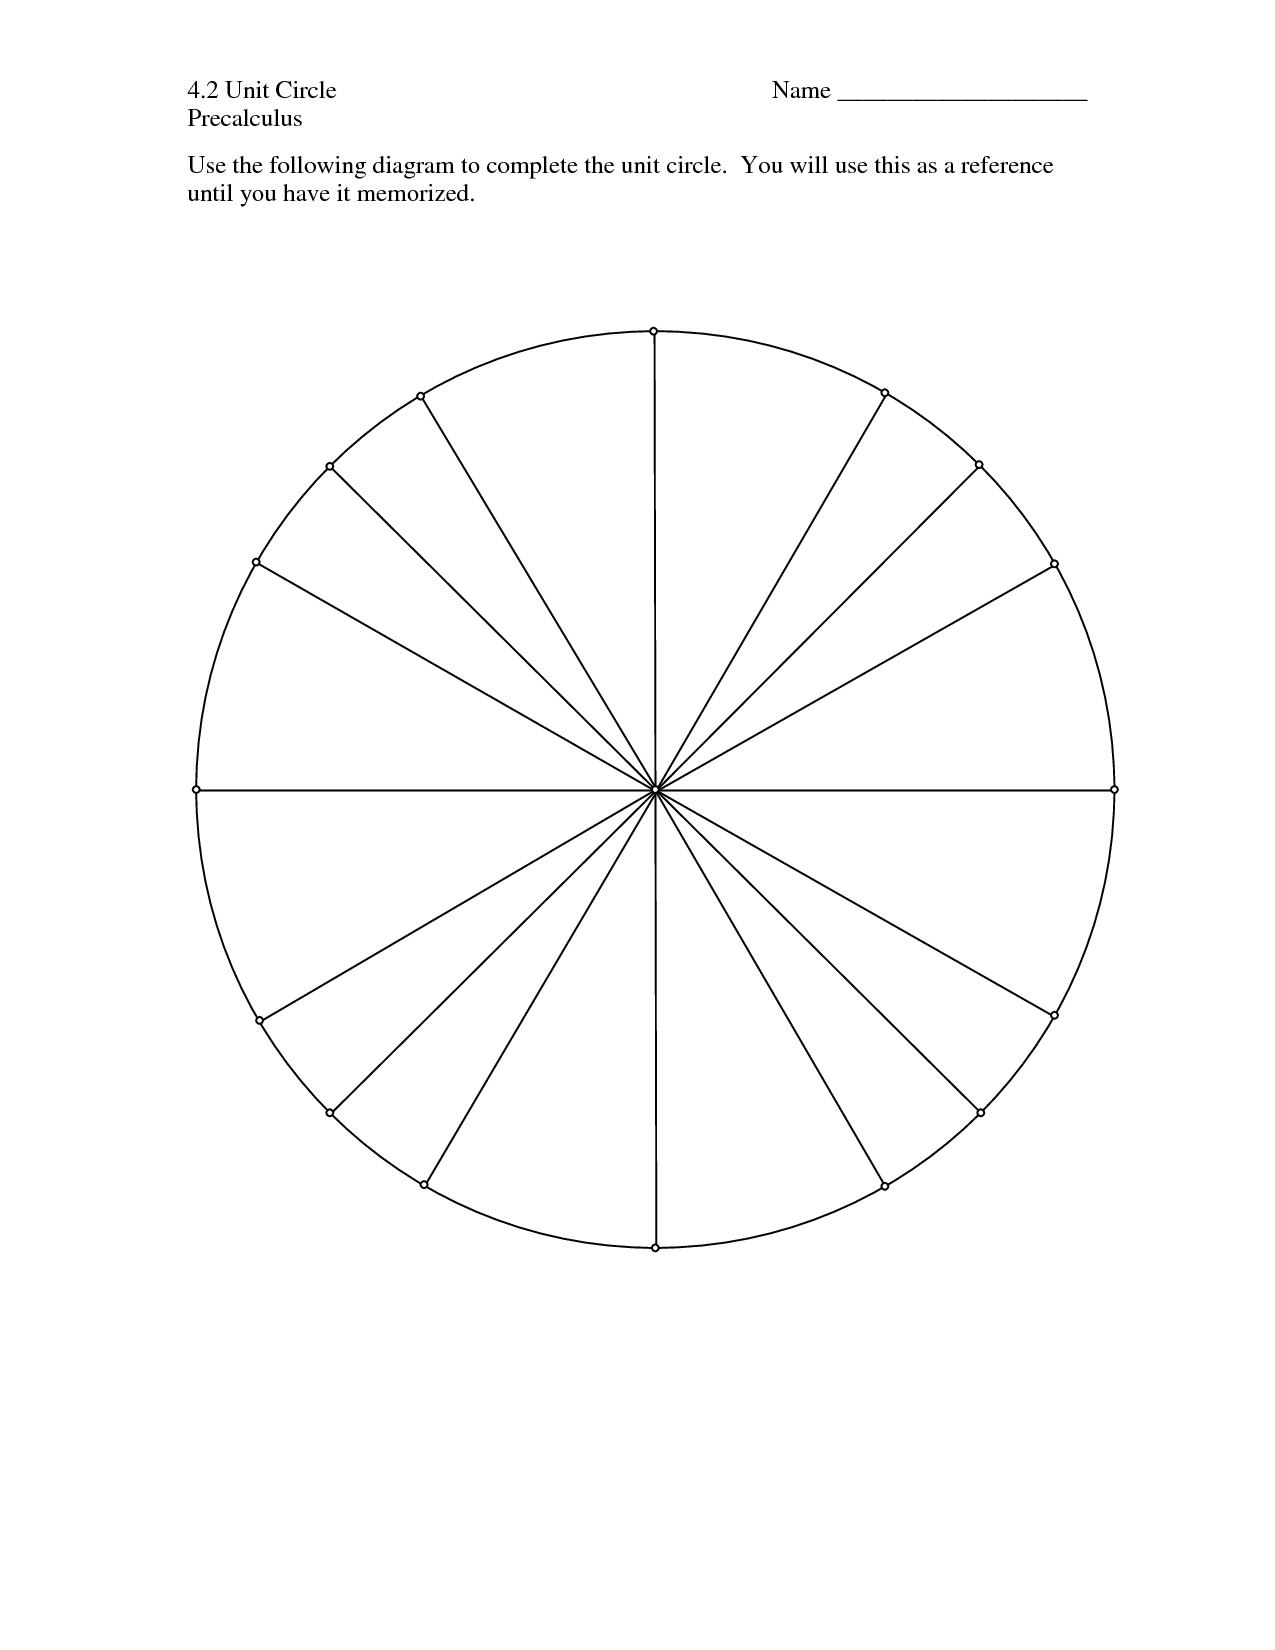 blank unit circle worksheet free worksheets library download and print worksheets free on. Black Bedroom Furniture Sets. Home Design Ideas